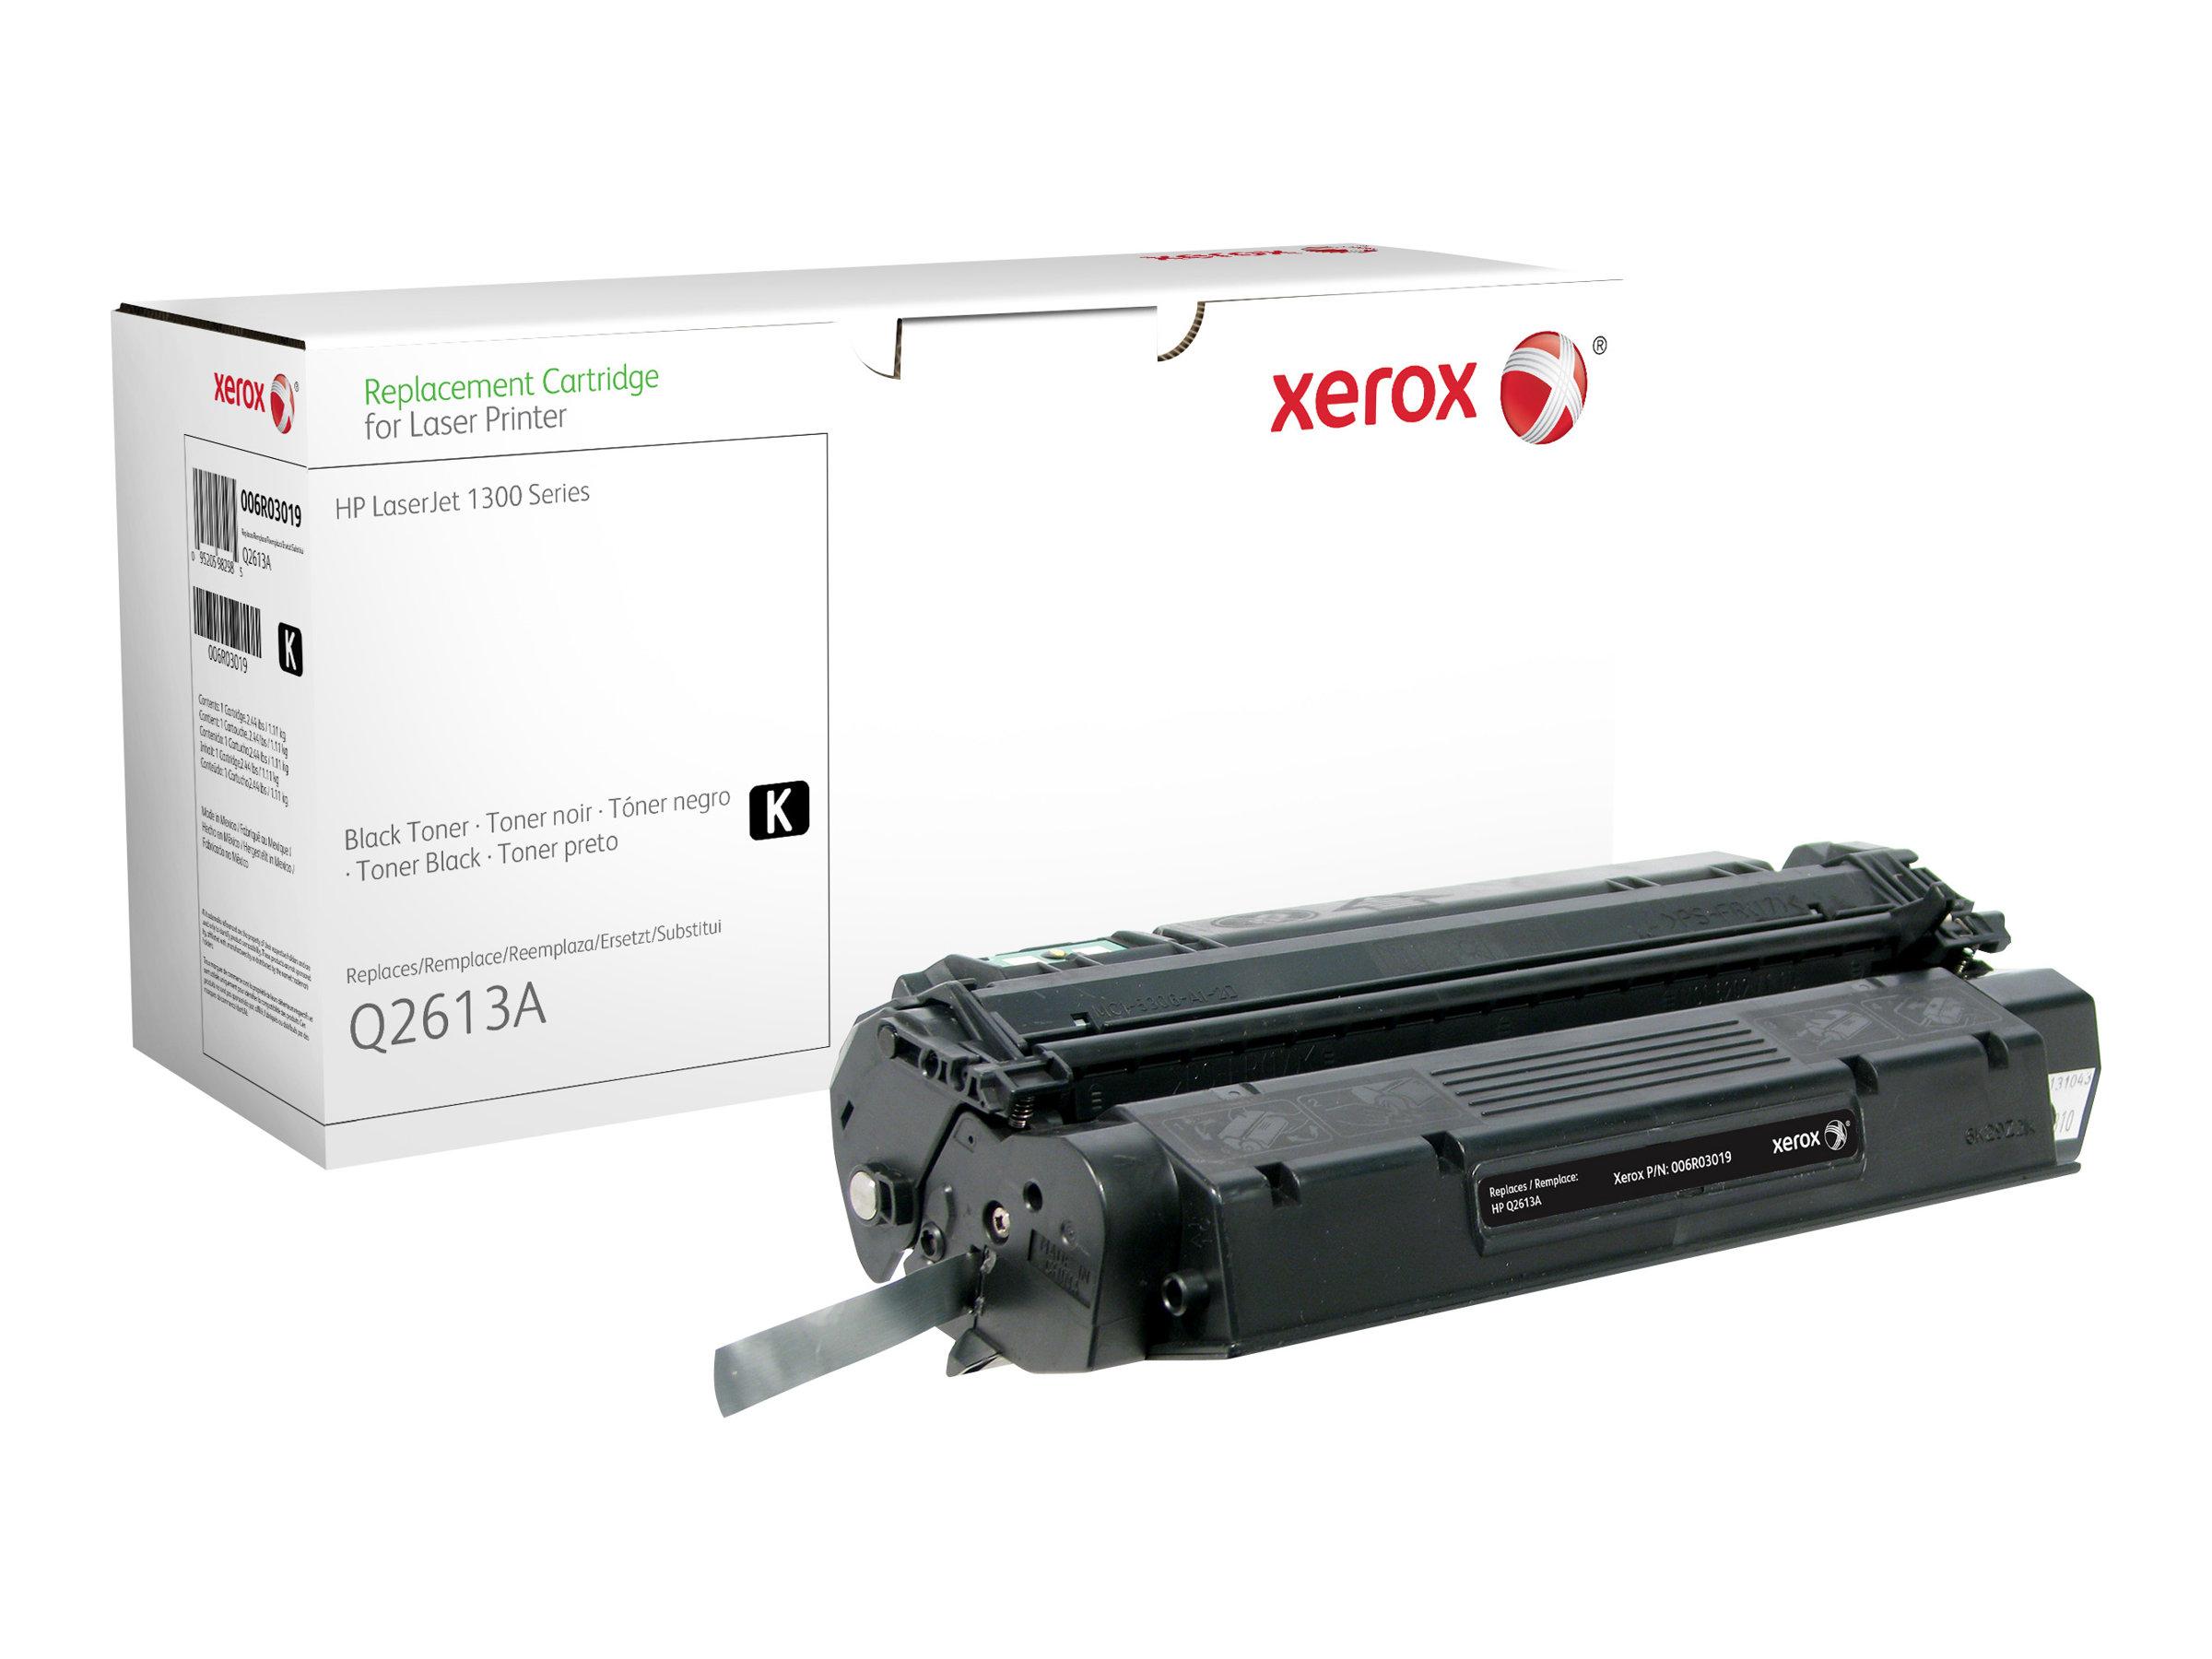 Xerox - Schwarz - Tonerpatrone (Alternative zu: HP Q2613A) - für HP LaserJet 1300, 1300n, 1300xi